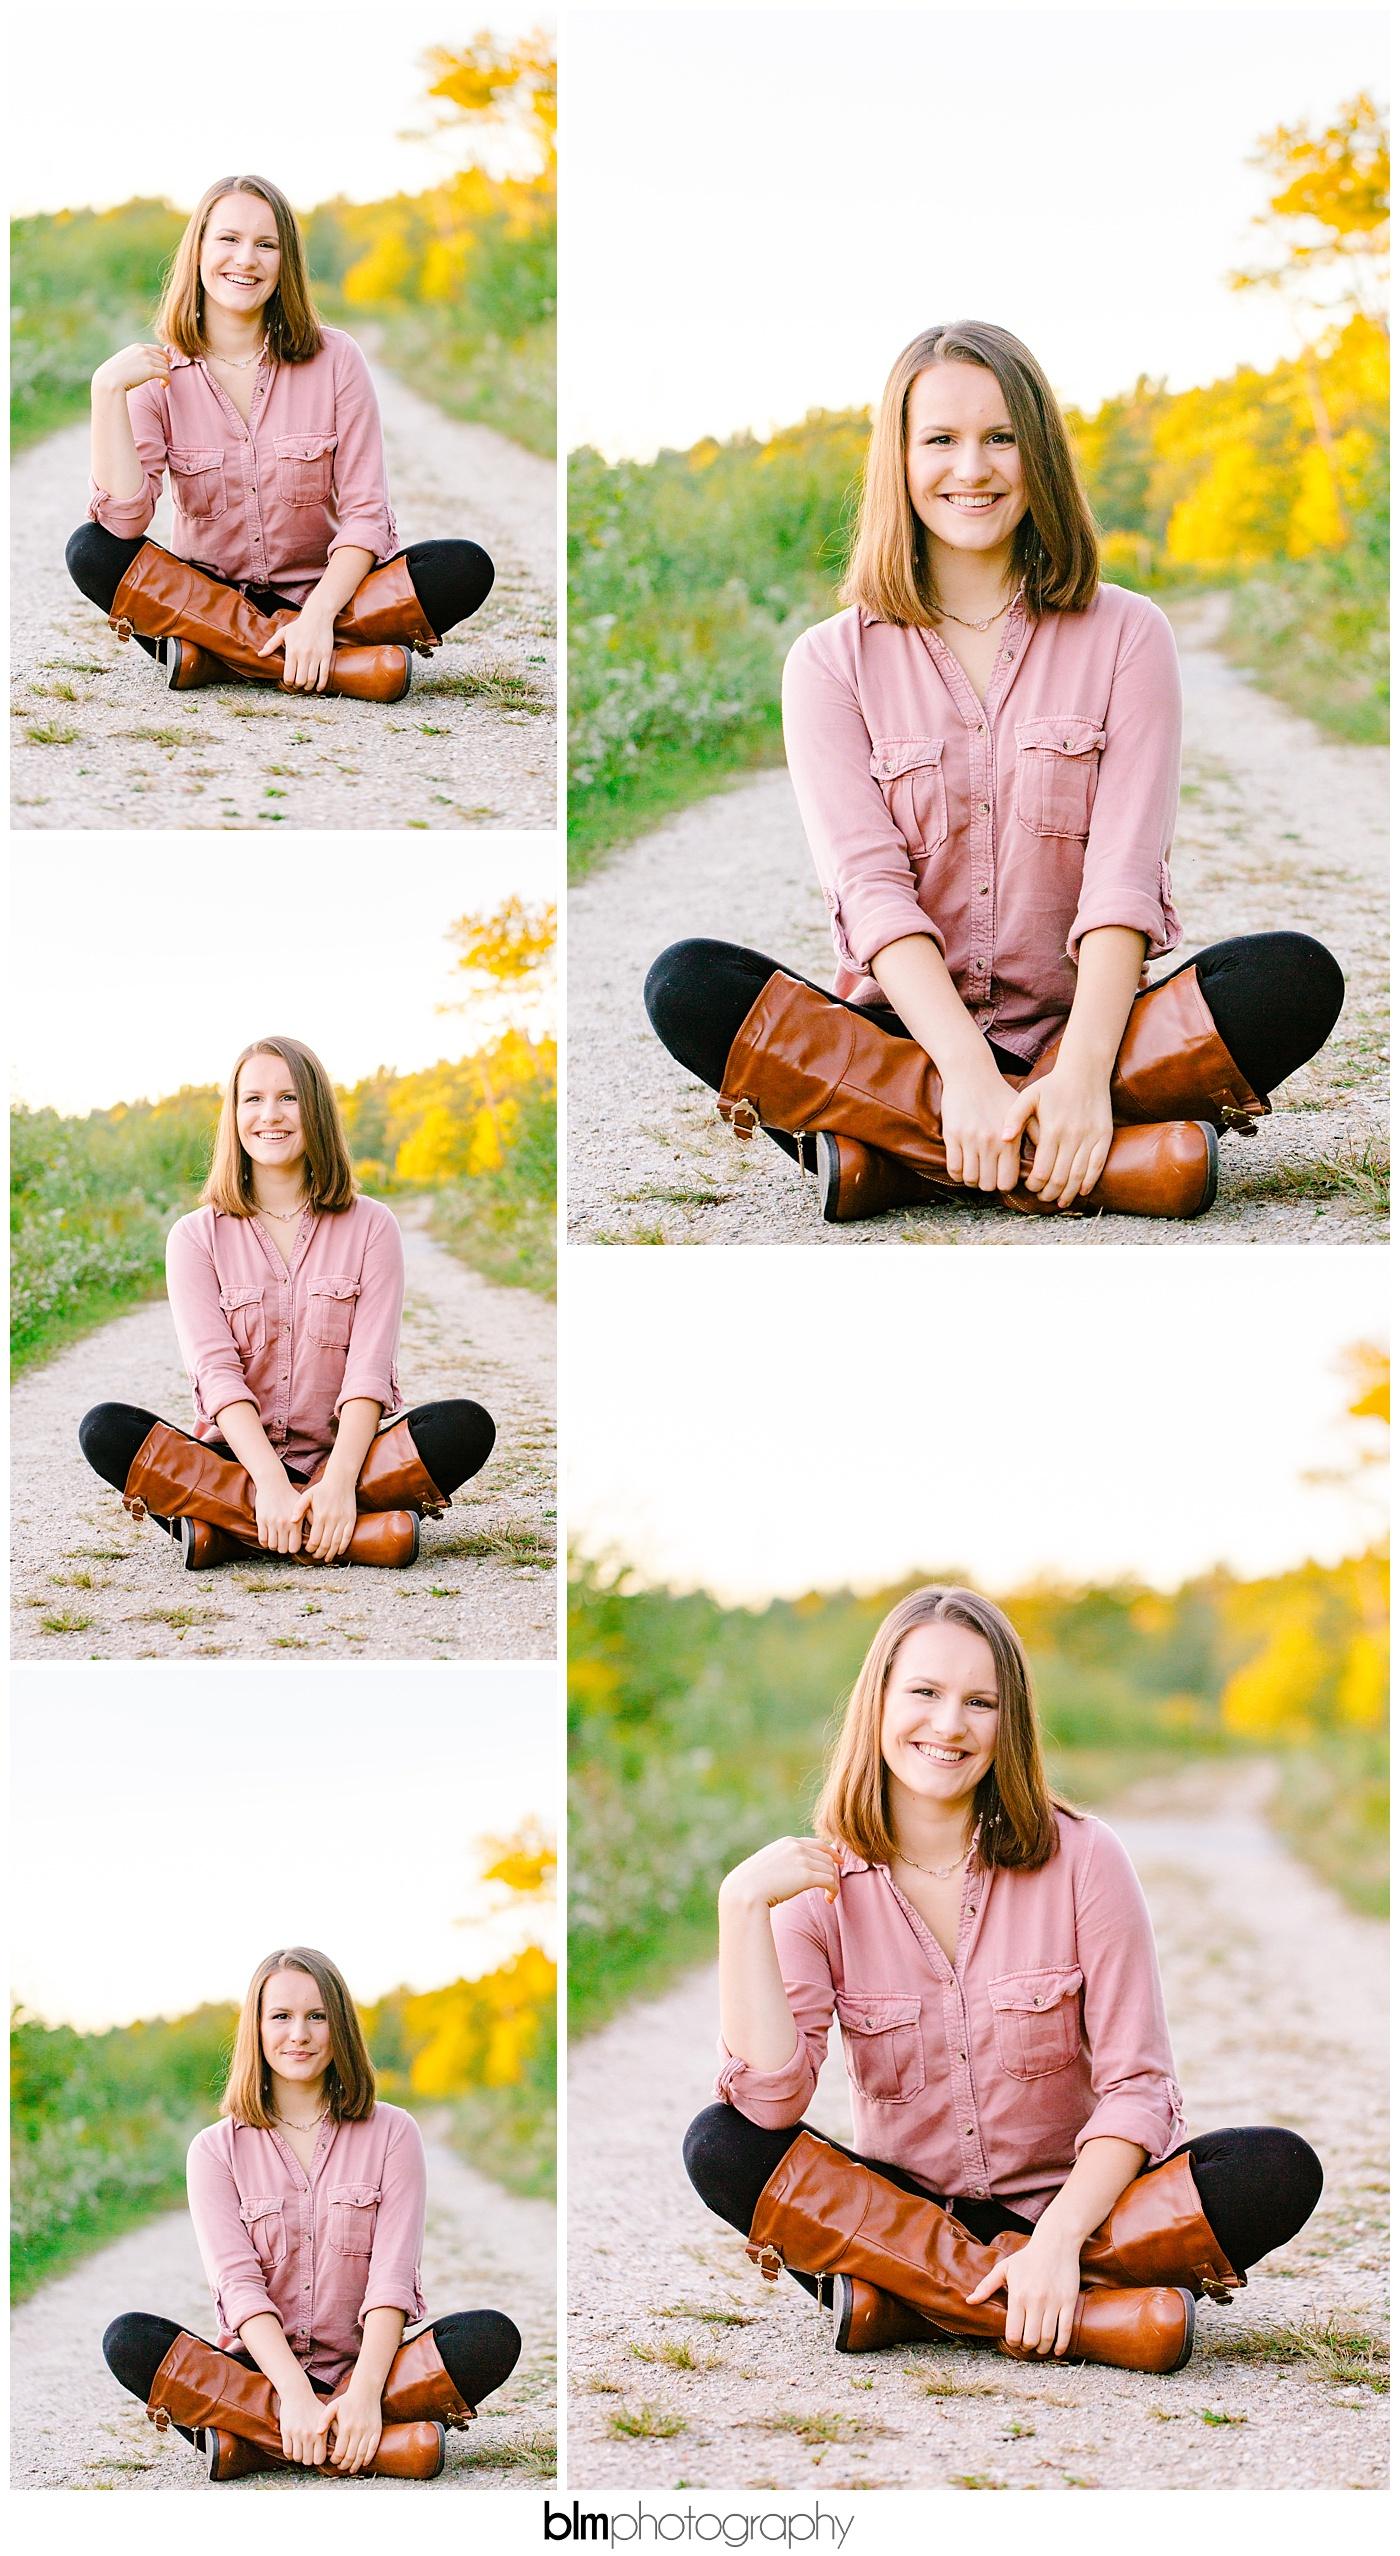 Isaac-and-Gwen_Senior-Portraits_091516-3396.jpg